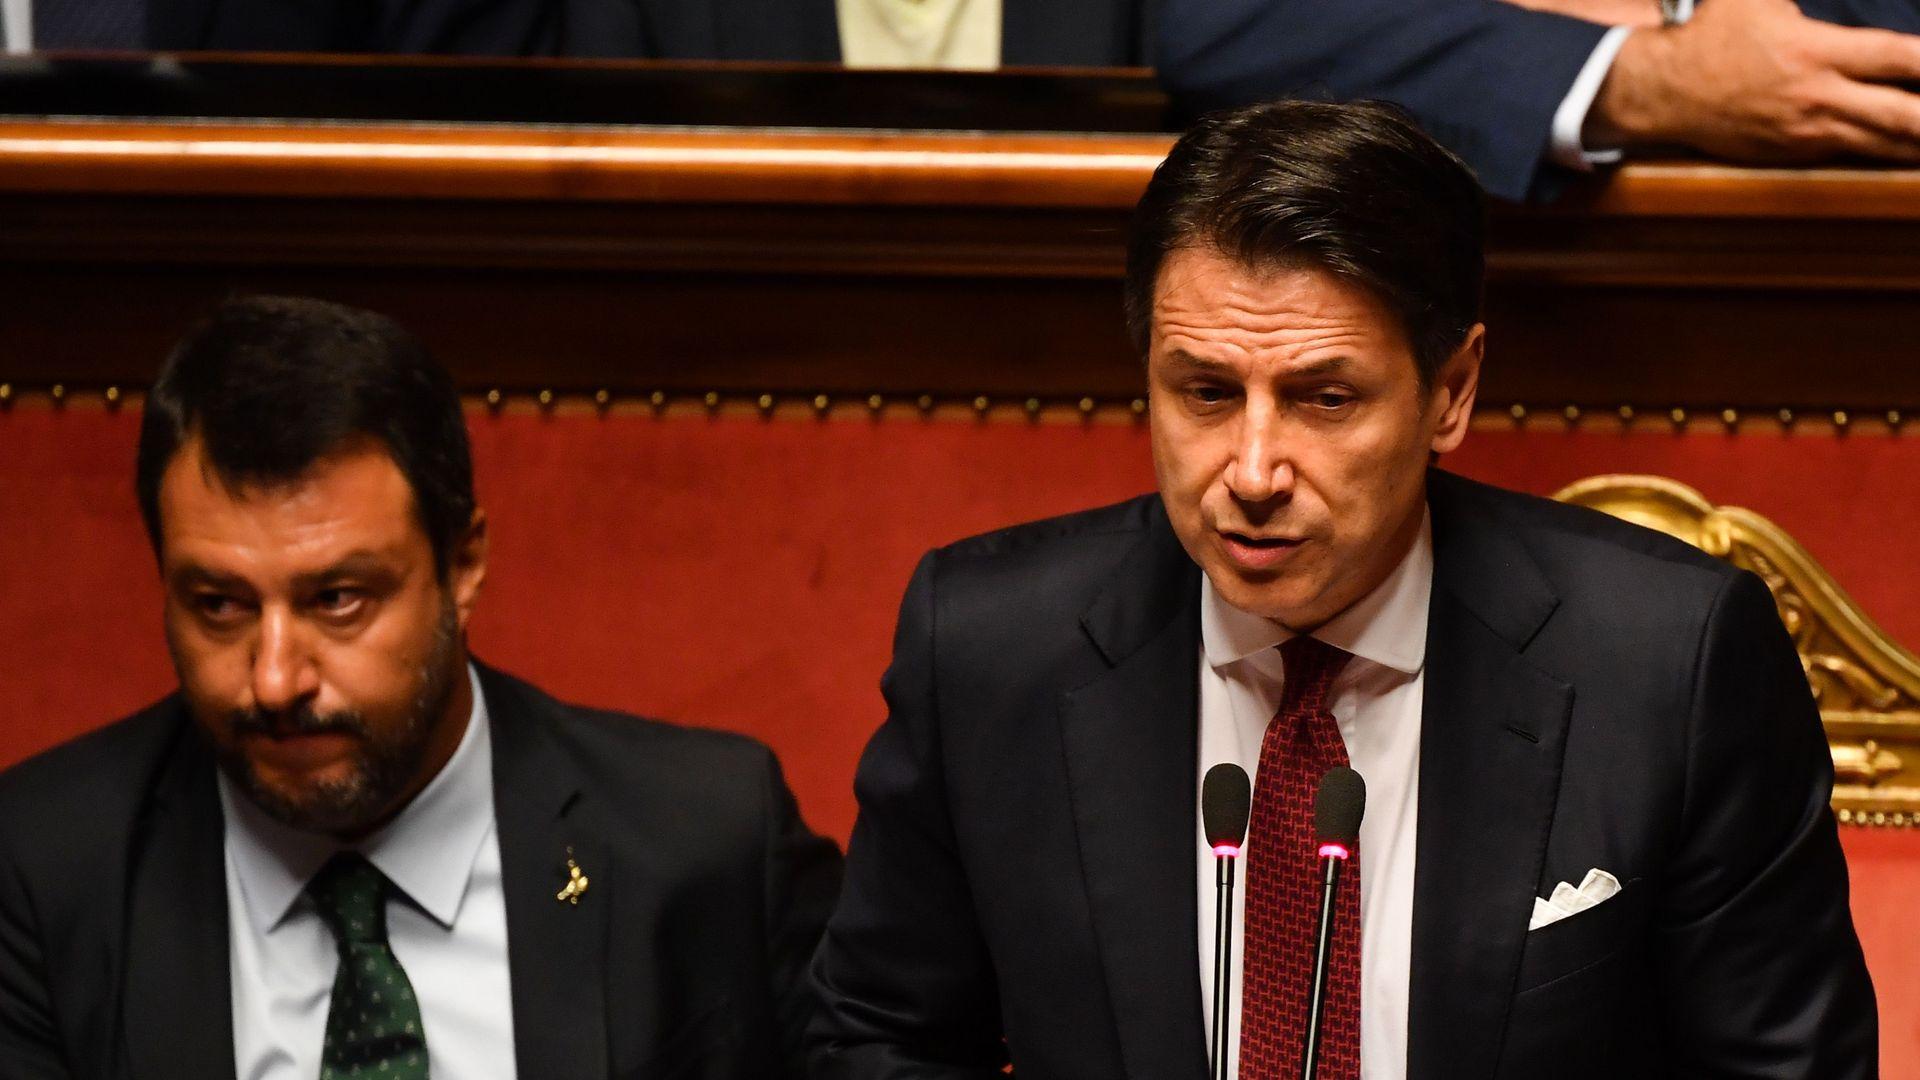 Giuseppe Conte and Matteo Salvini